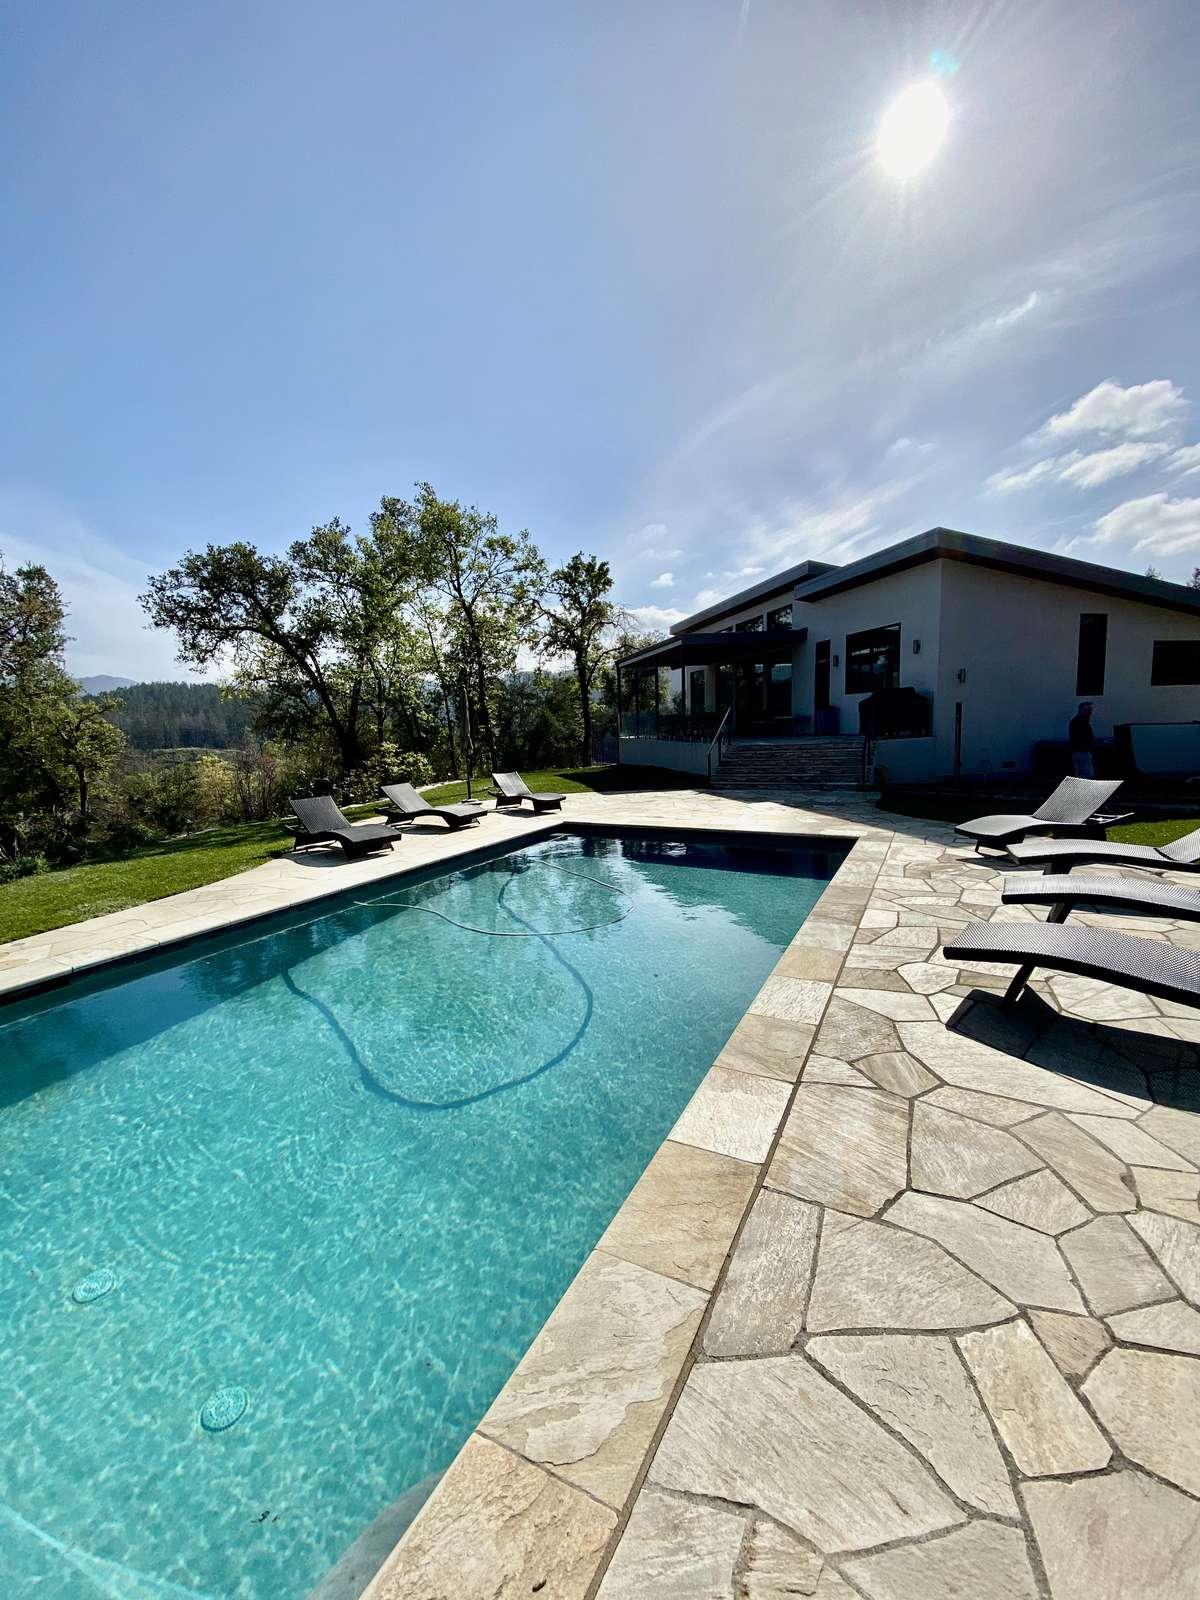 Large pool with views of vineyards beyond